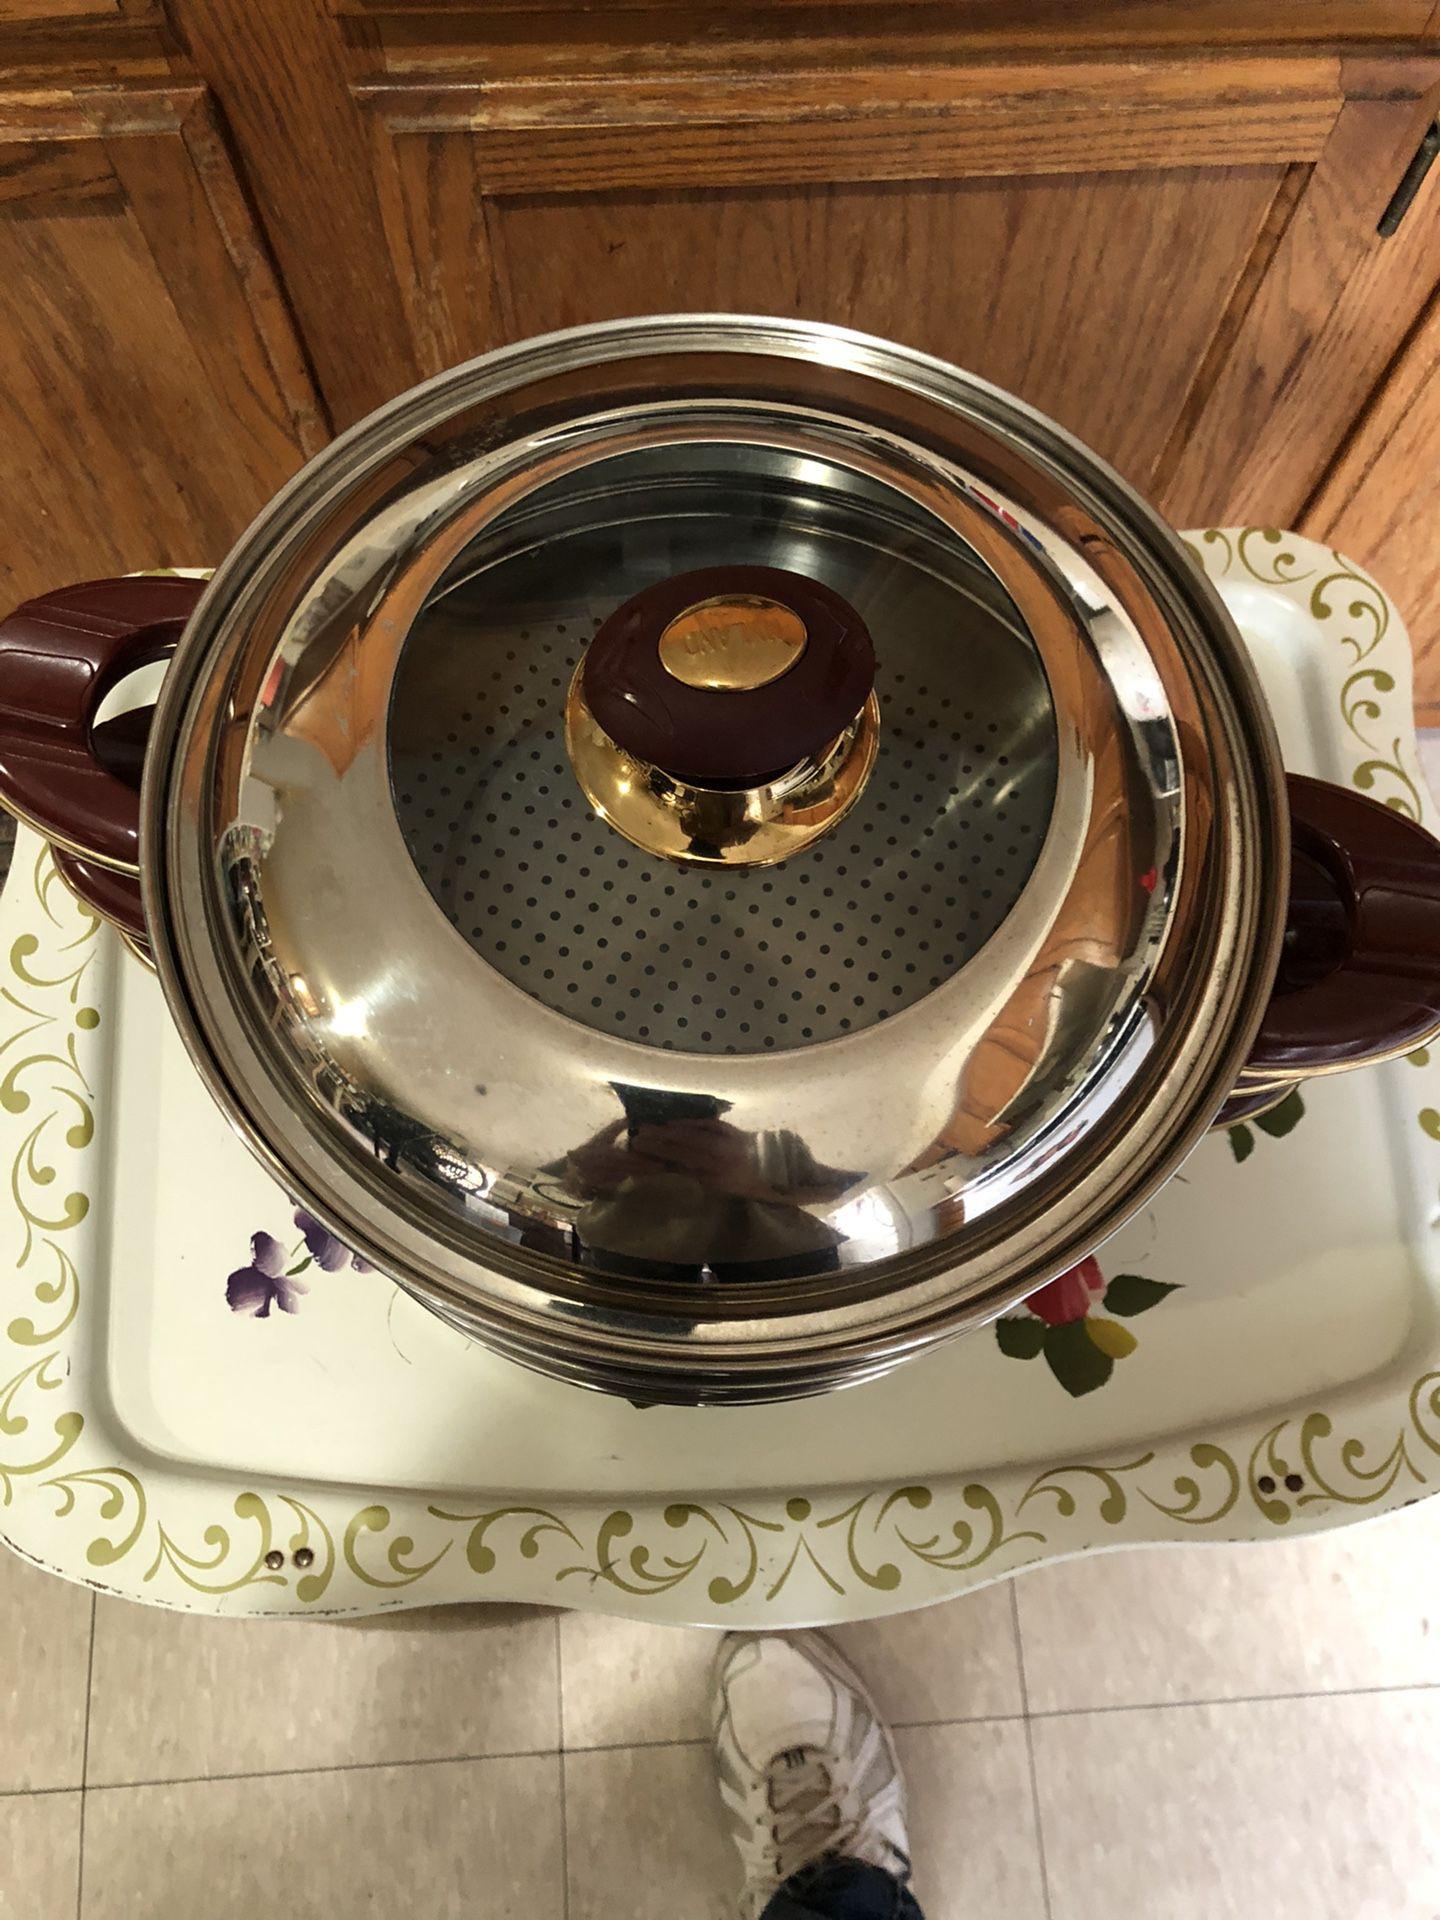 Stovetop steamer to tears plus pot